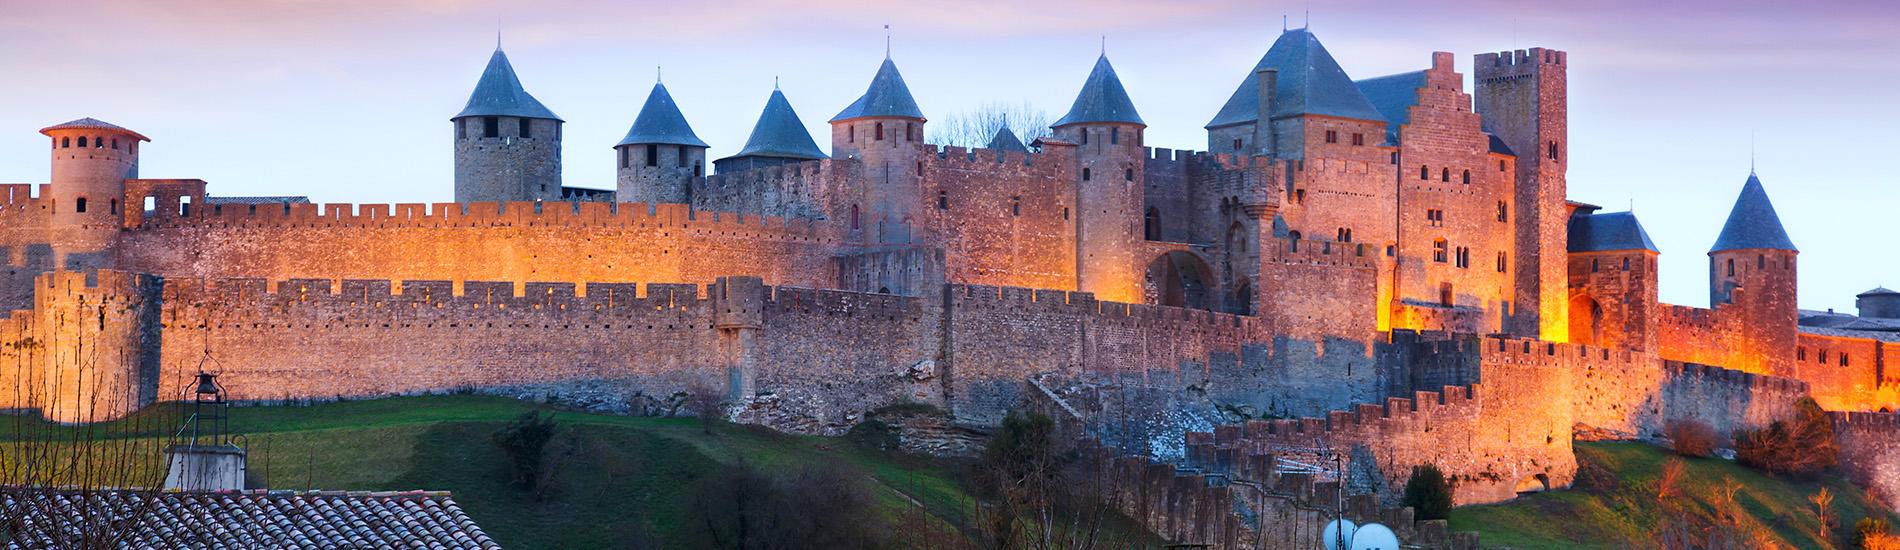 Carcassonne城堡